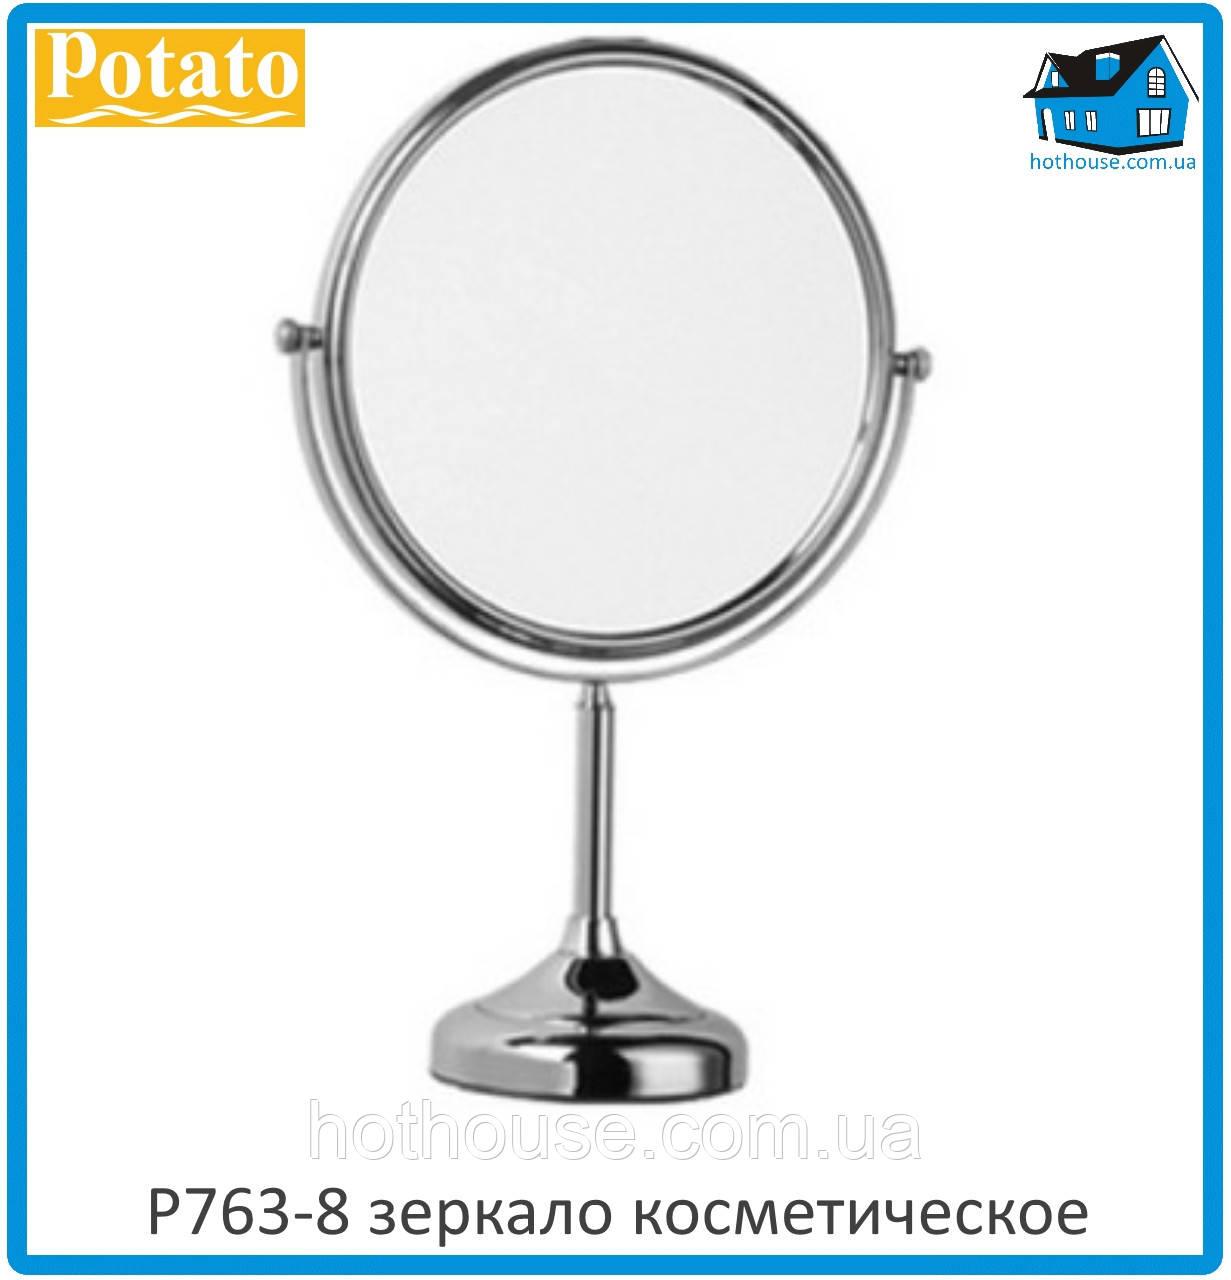 Зеркало косметическое  P763-8